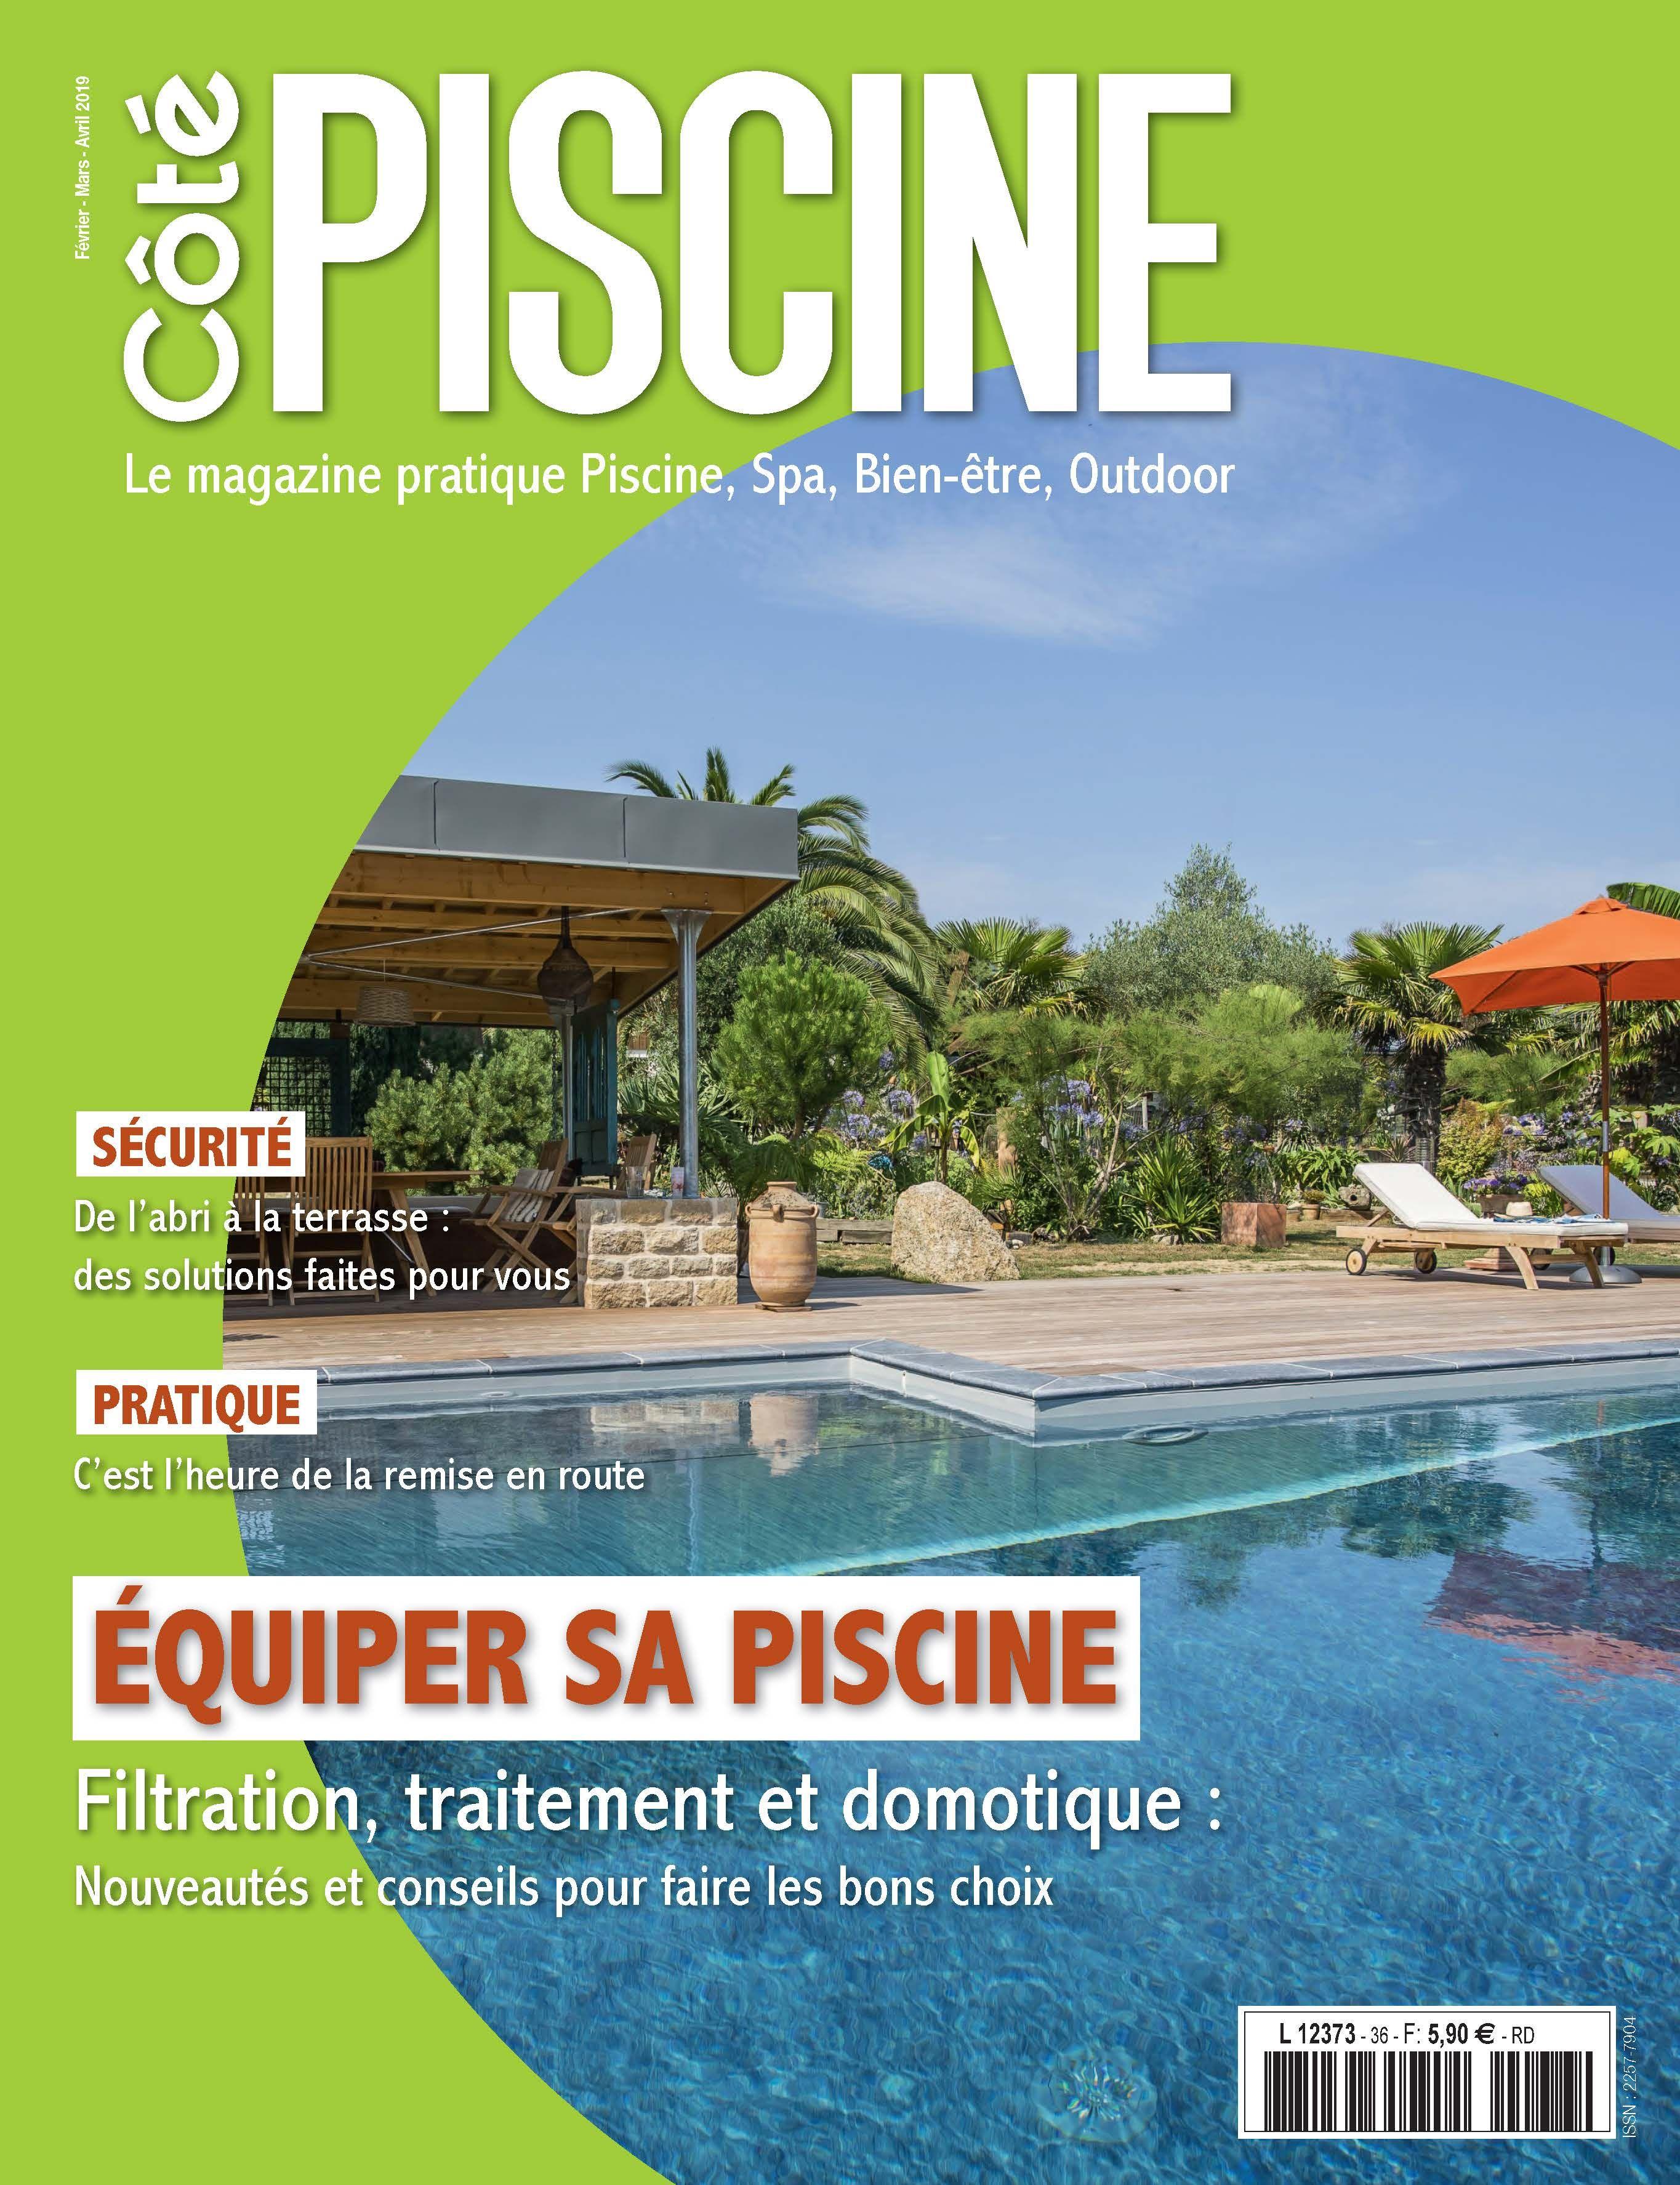 Une piscine design et durable - Piscinelle